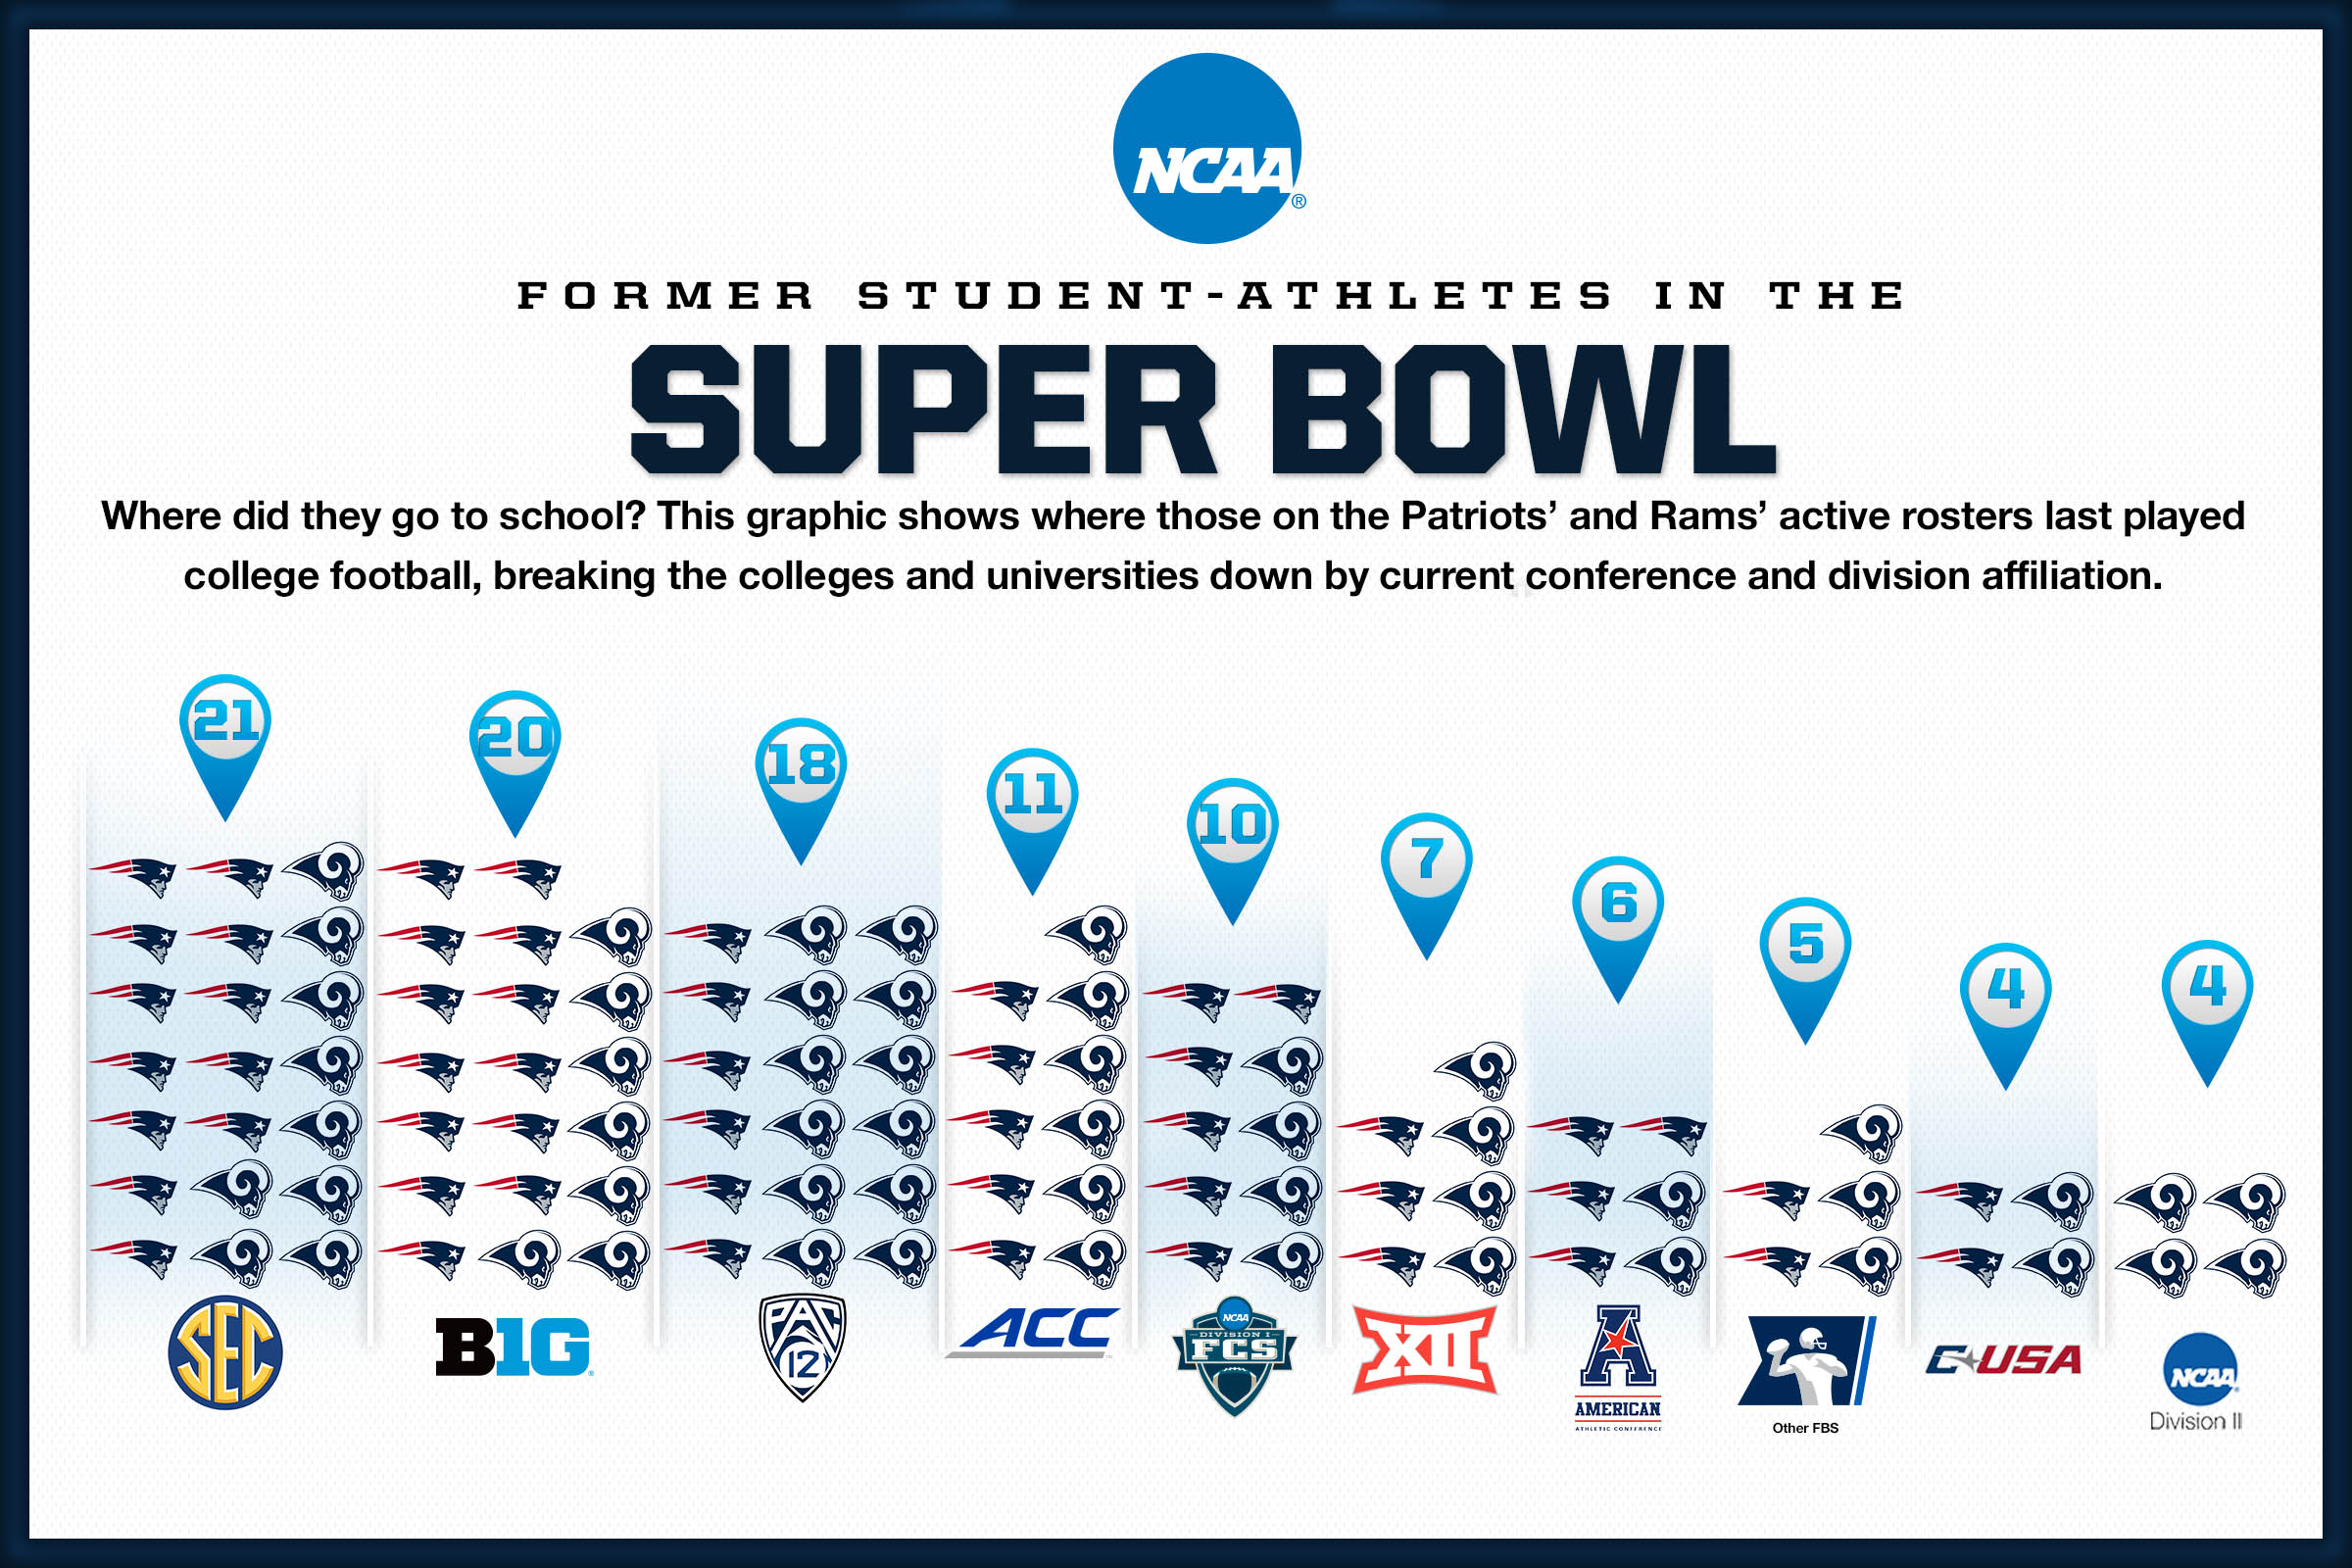 Super Bowl LIII has many former college football stars